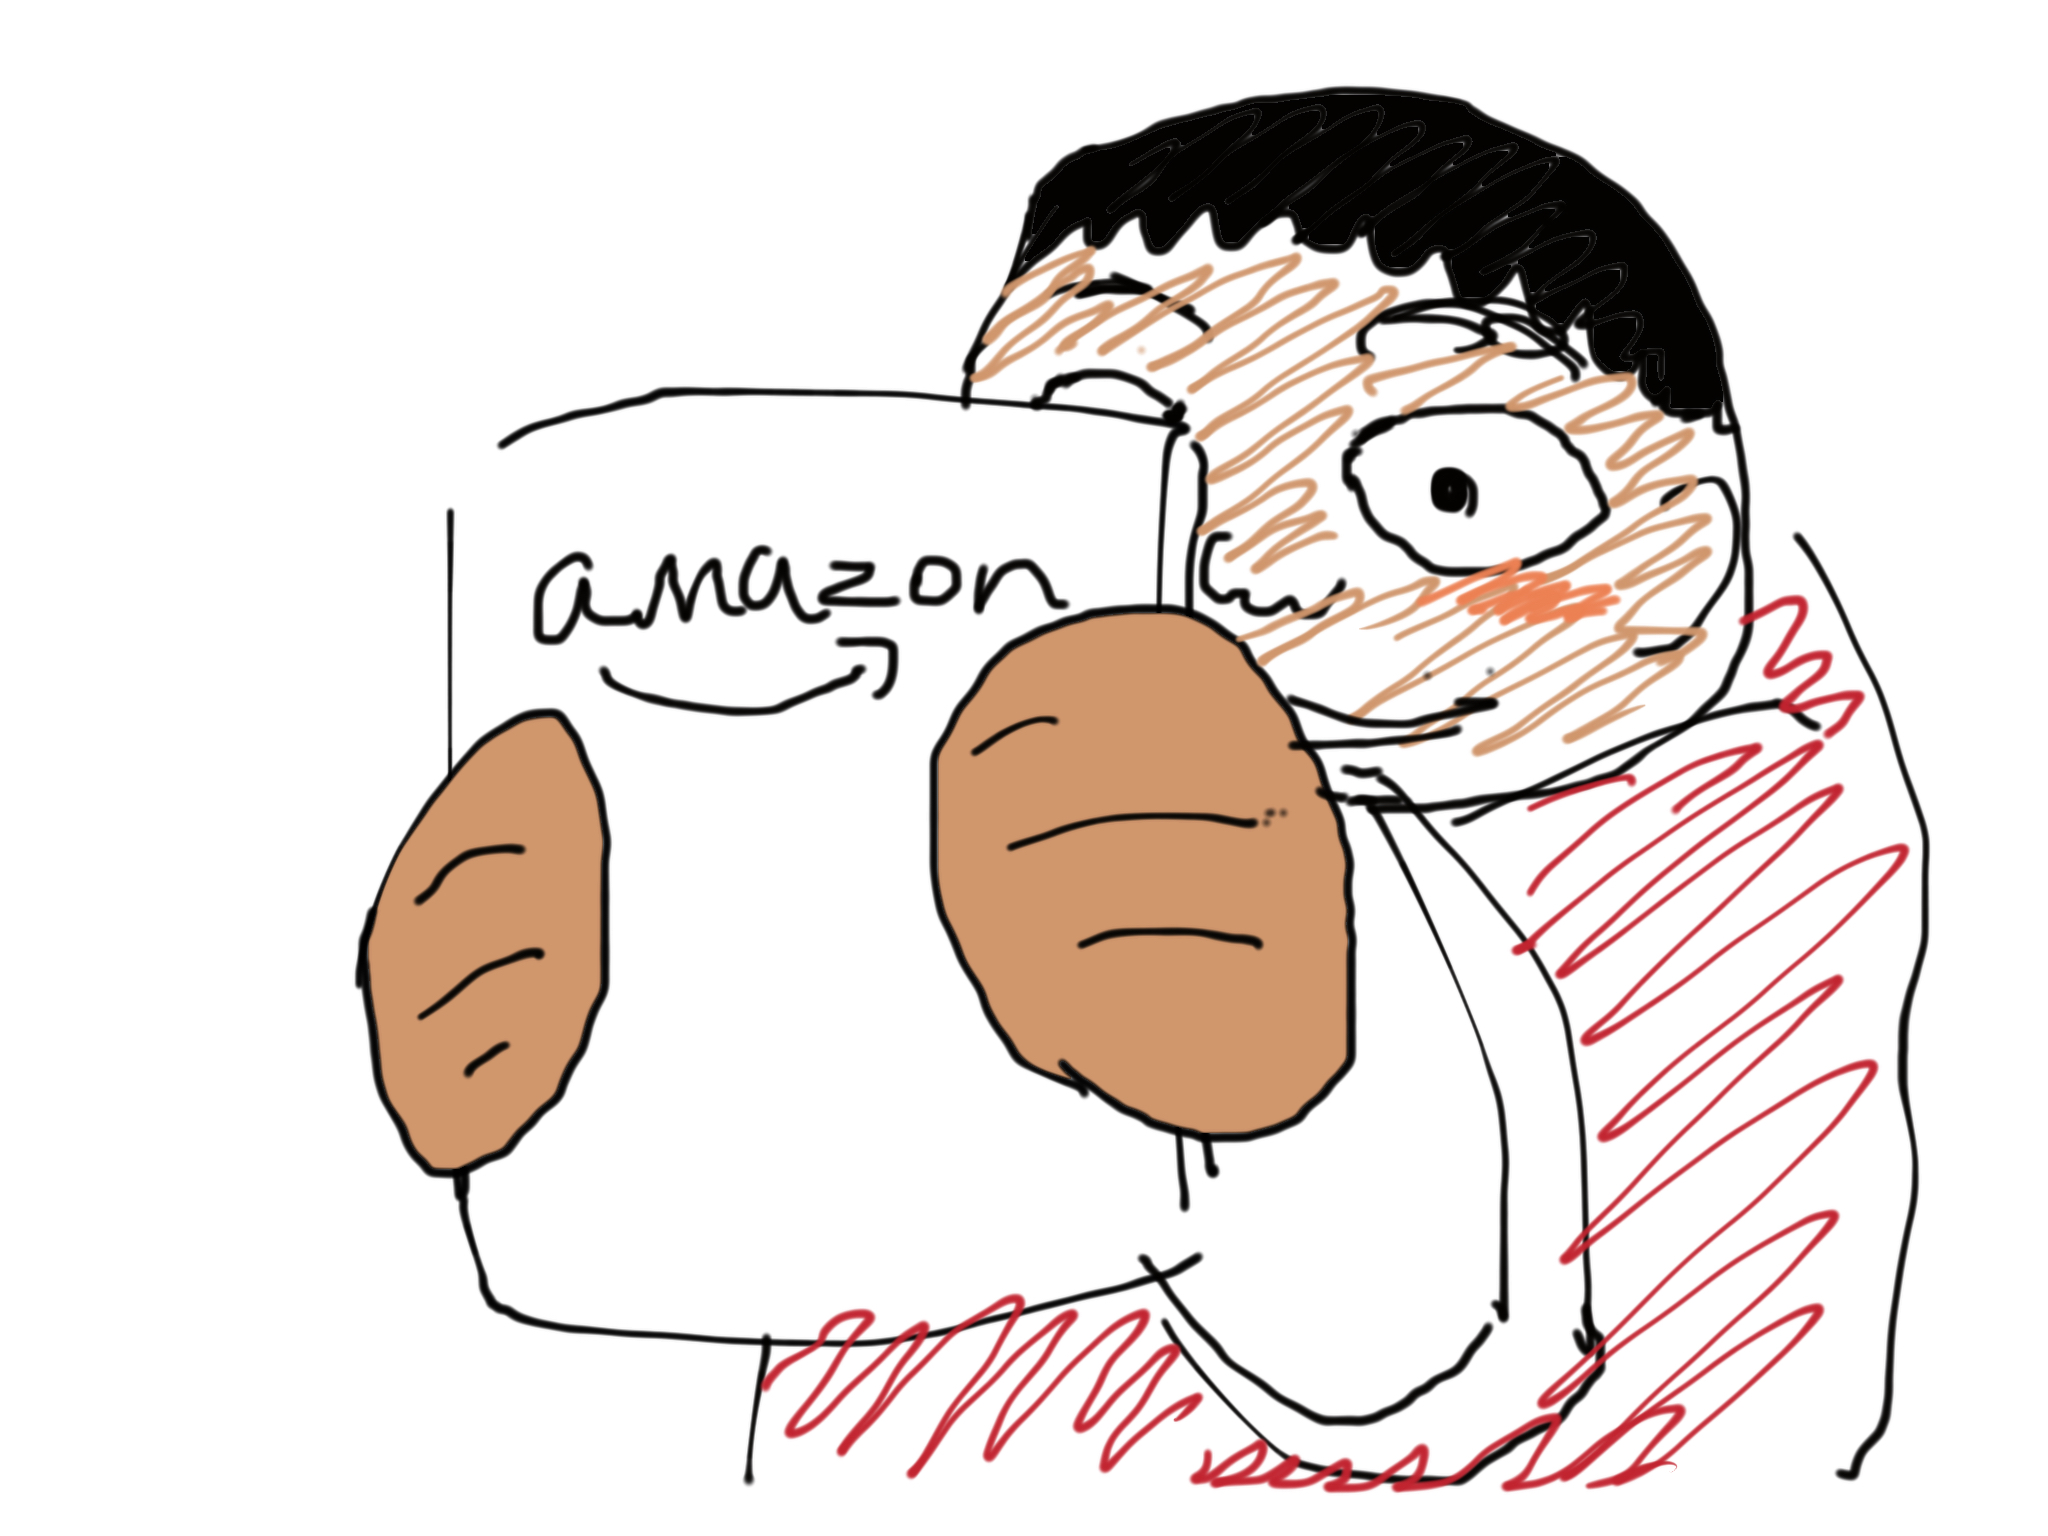 Netflixに続きアマゾンも日本でサービス開始!主要動画配信サービスを比較してみた